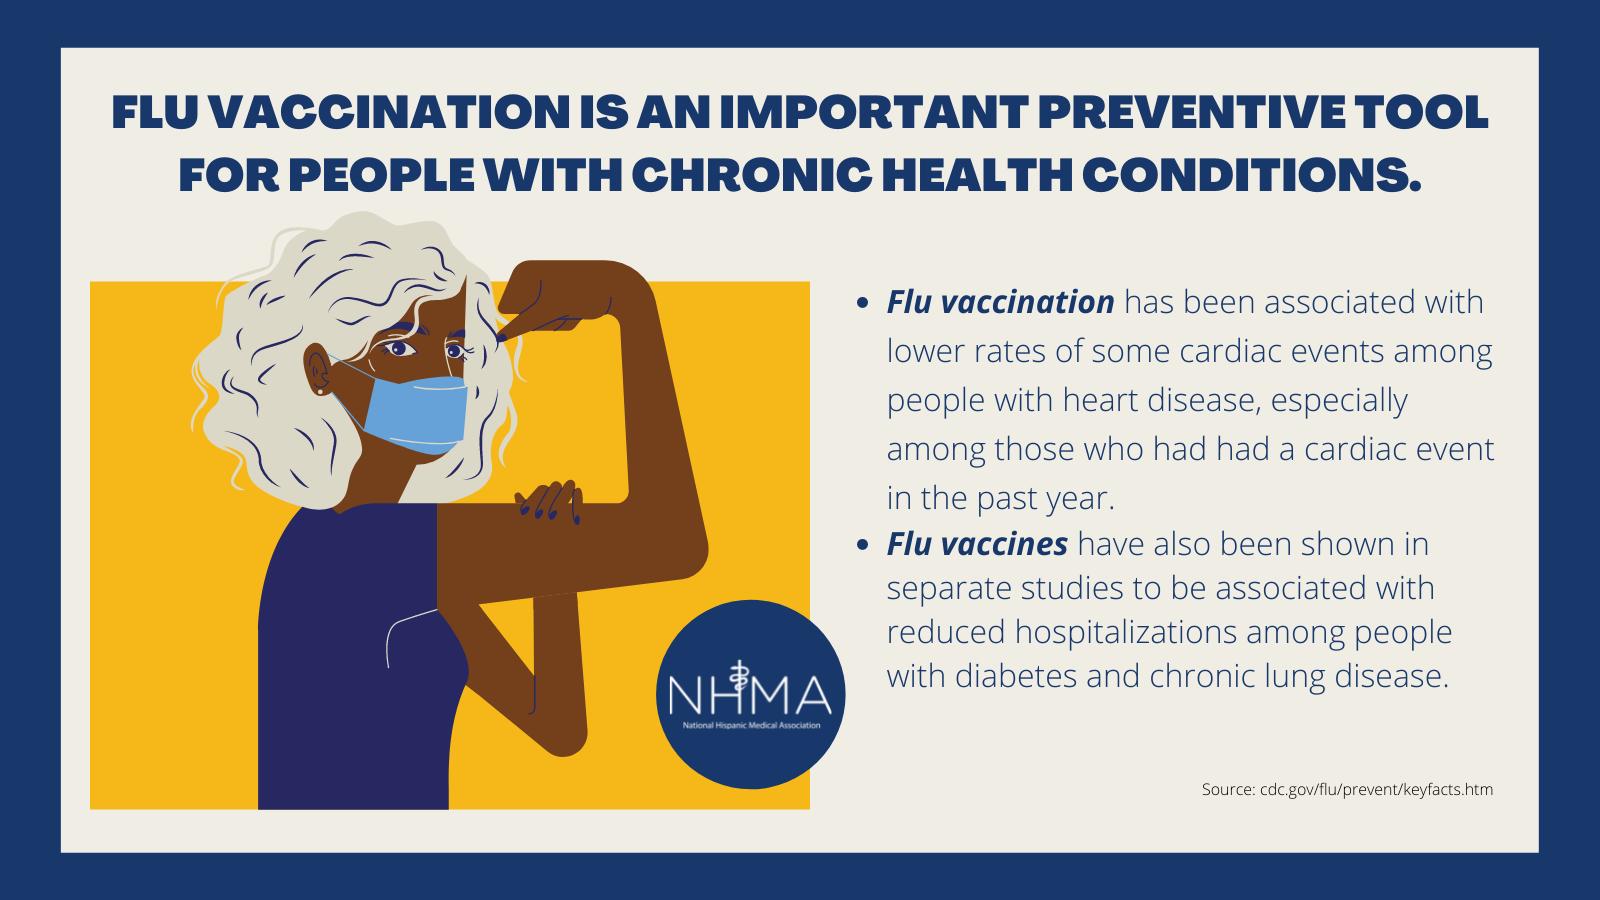 flu vaccination is preventative flyer